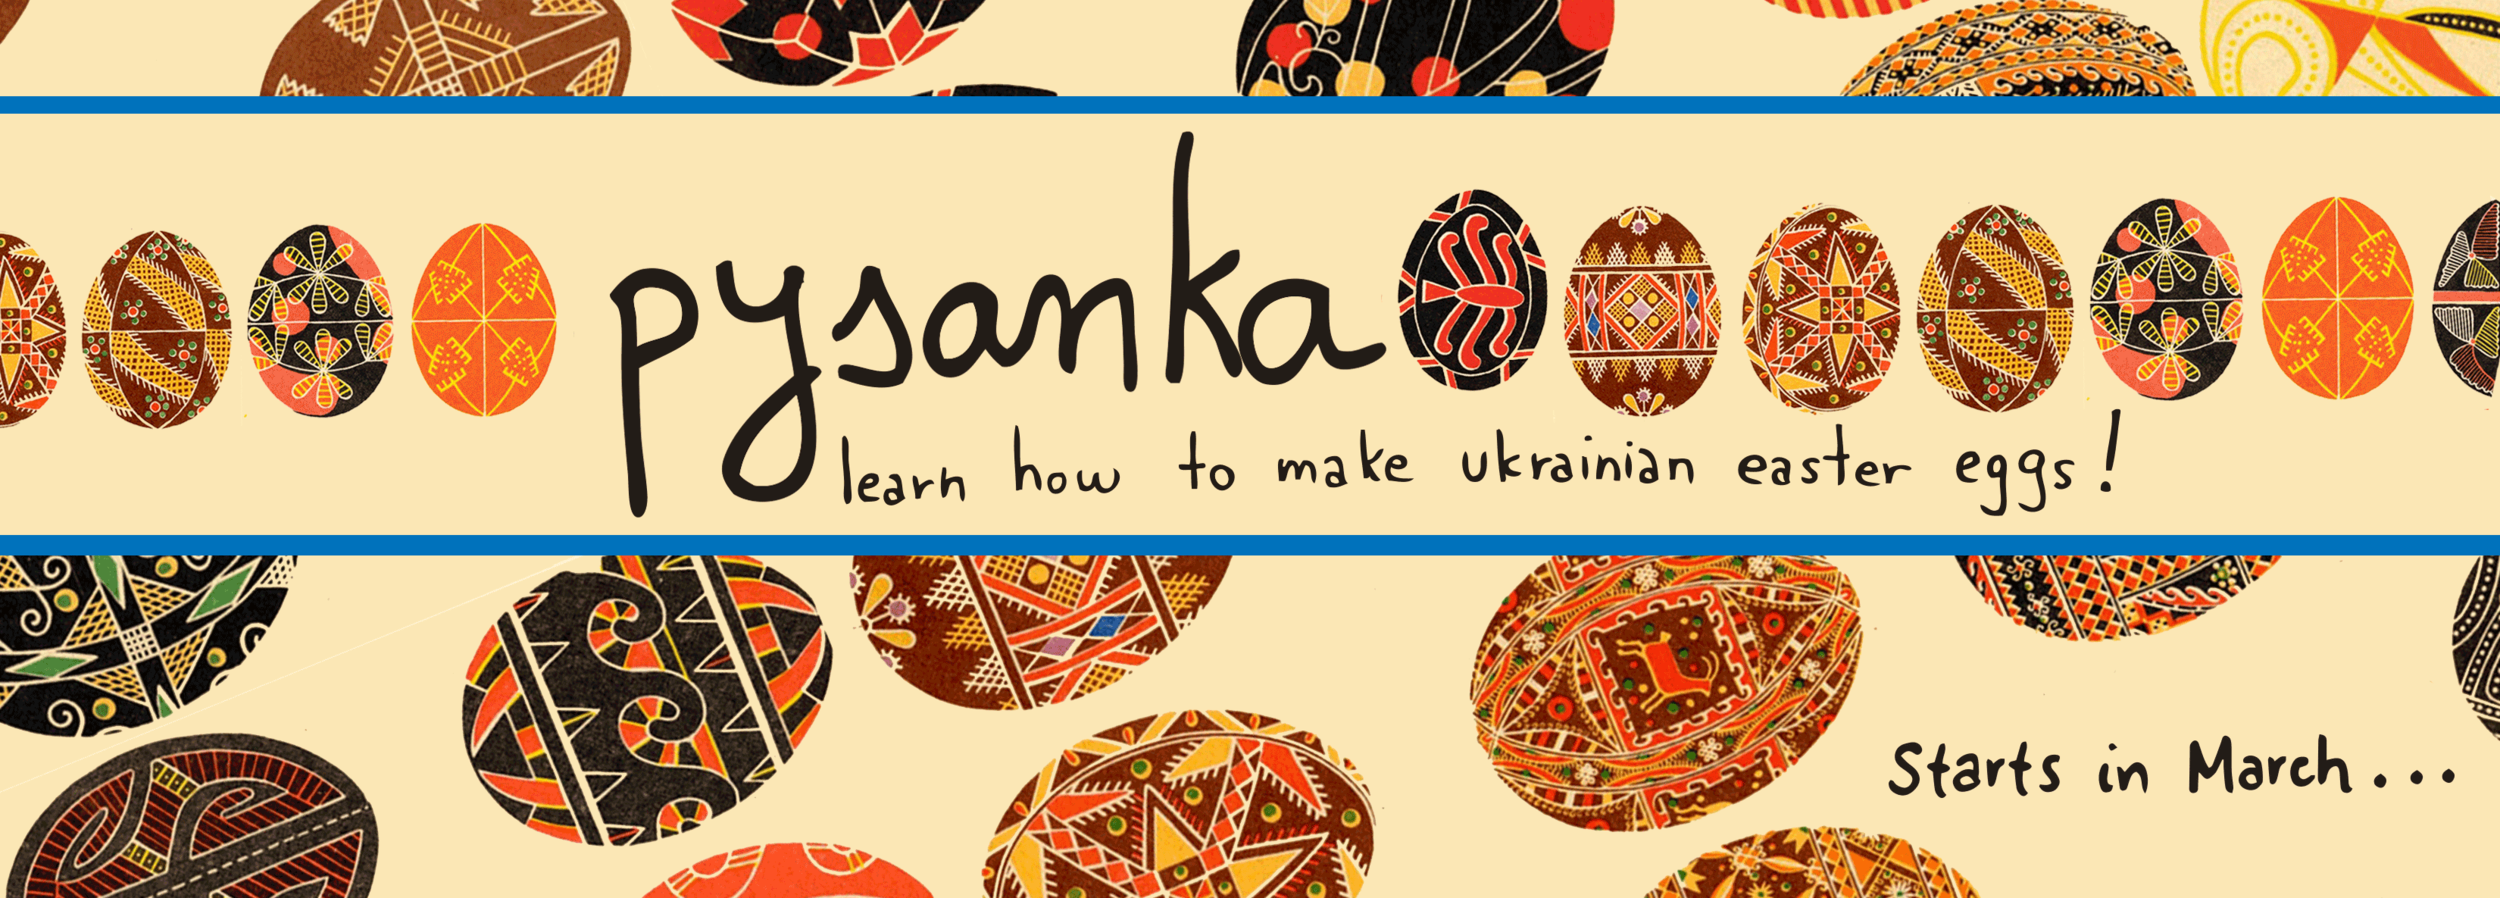 pysanka-banner-kosa-site.png